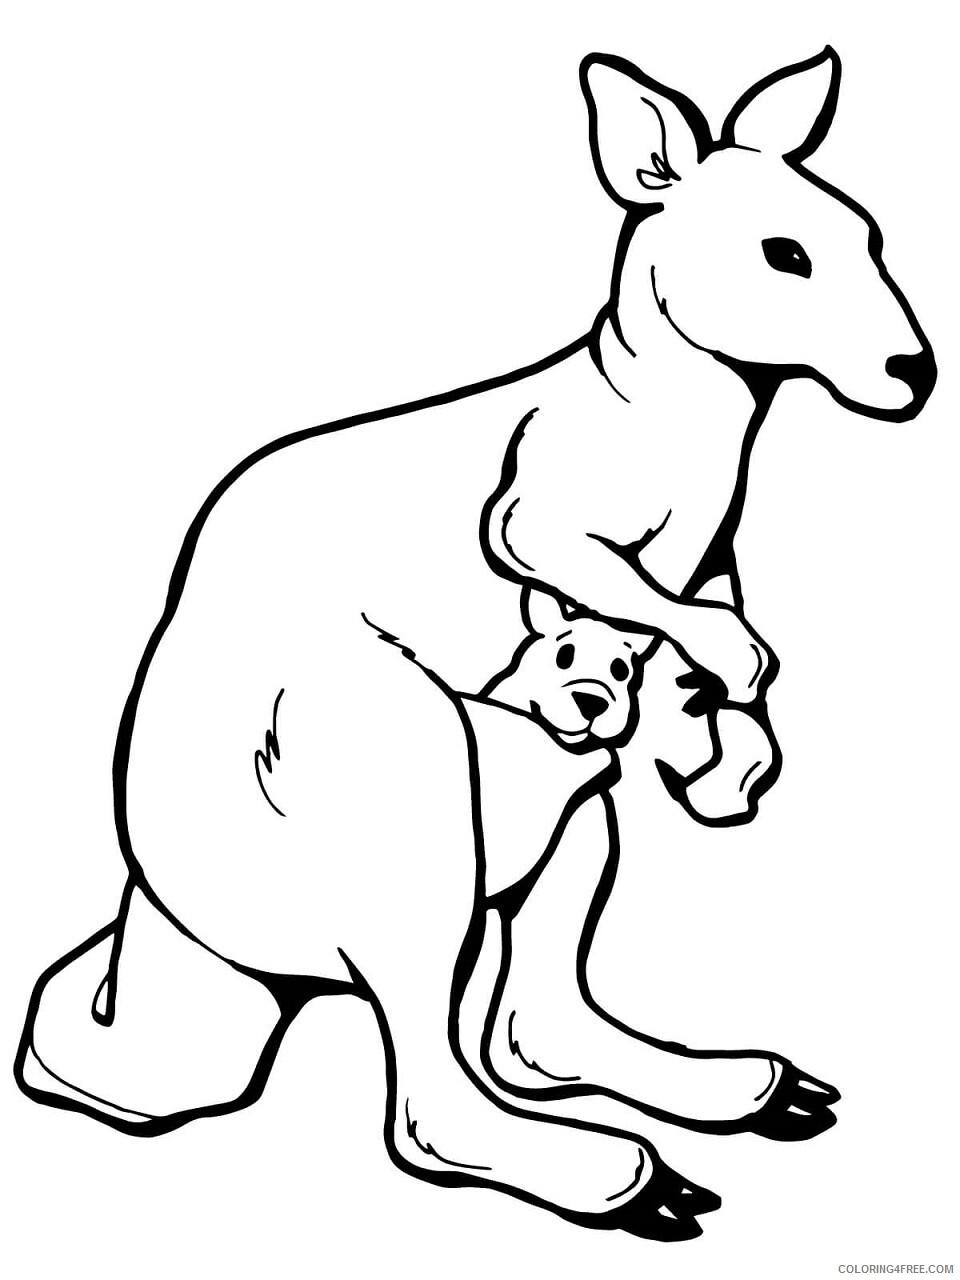 Kangaroo Coloring Pages Animal Printable Sheets kangaroo with a joey 2021 2959 Coloring4free